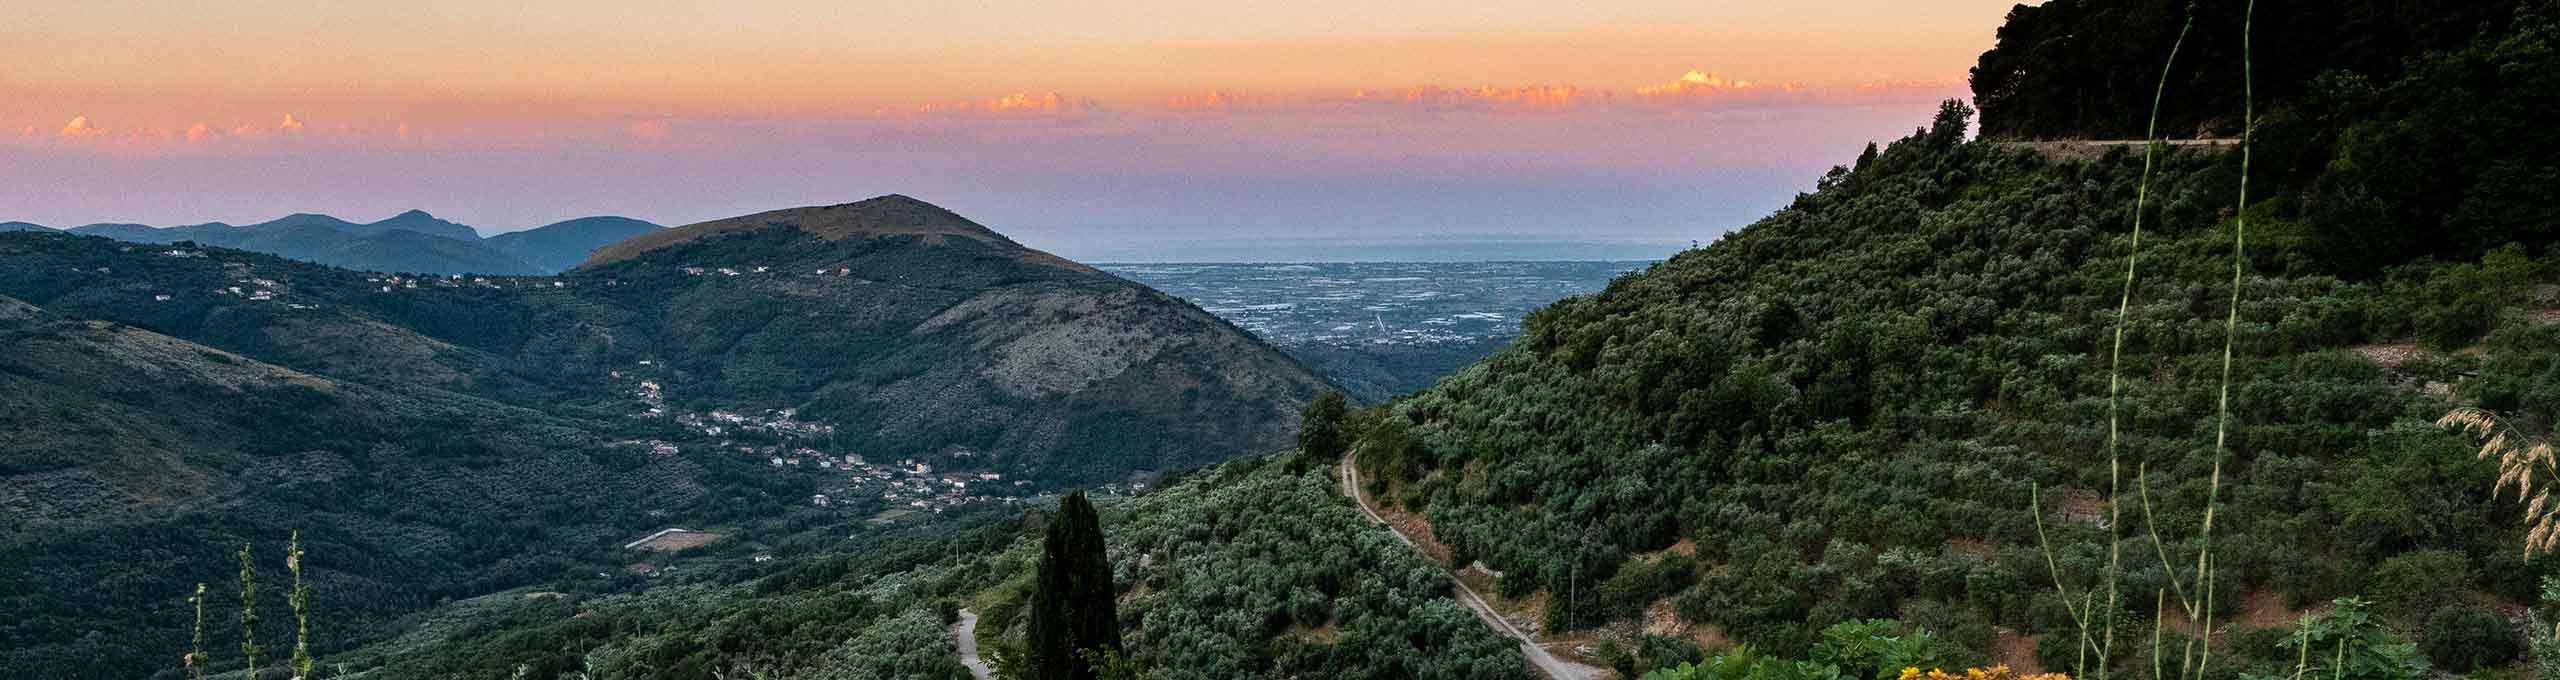 Lenola, Riviera di Ulisse